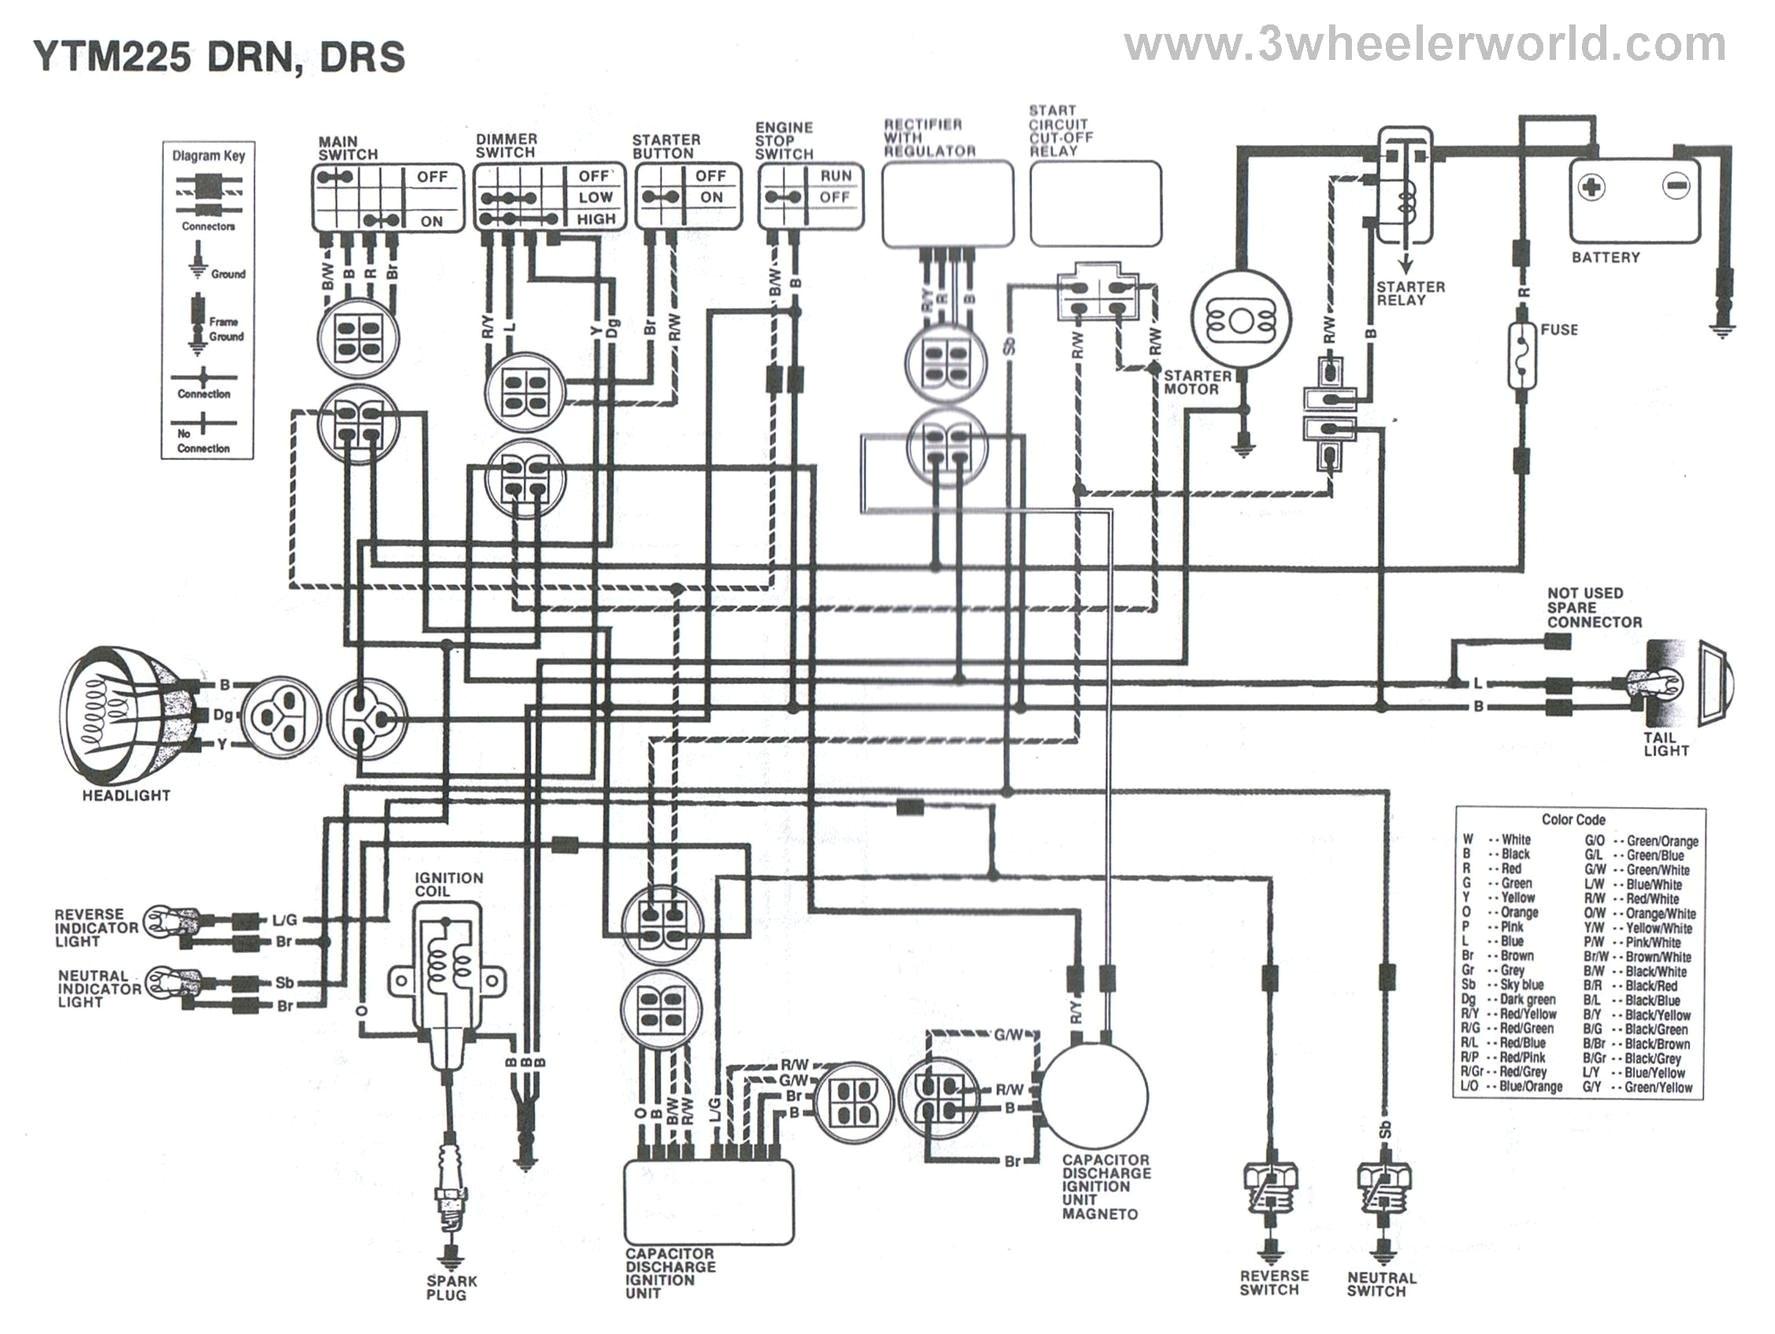 yamaha at1 wiring diagram wiring diagramwiring diagram yamaha 125zr wiring diagram list